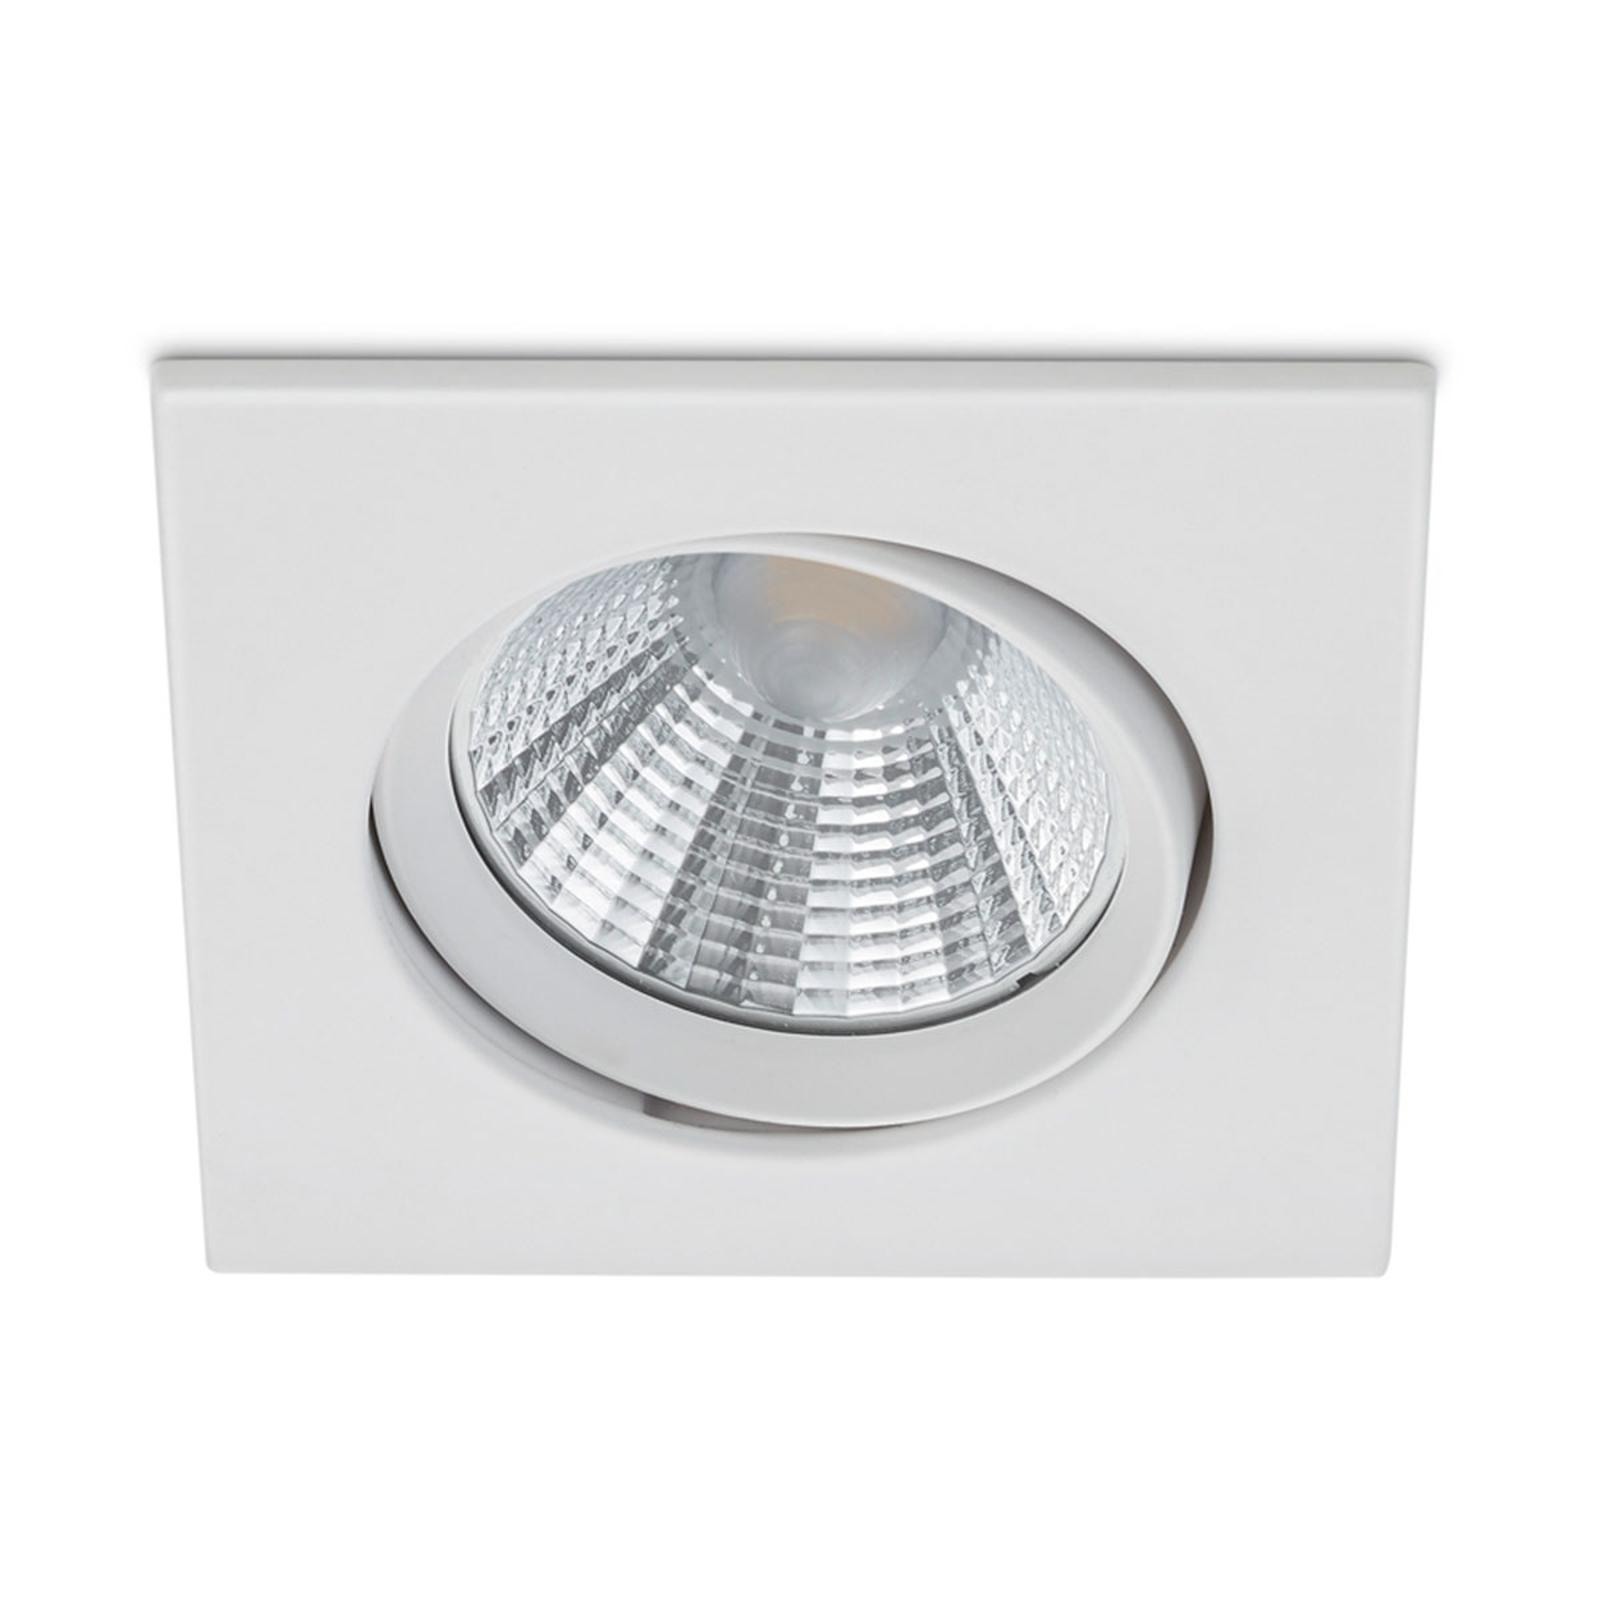 Dimmbarer LED-Einbaustrahler Pamir in mattem Weiß